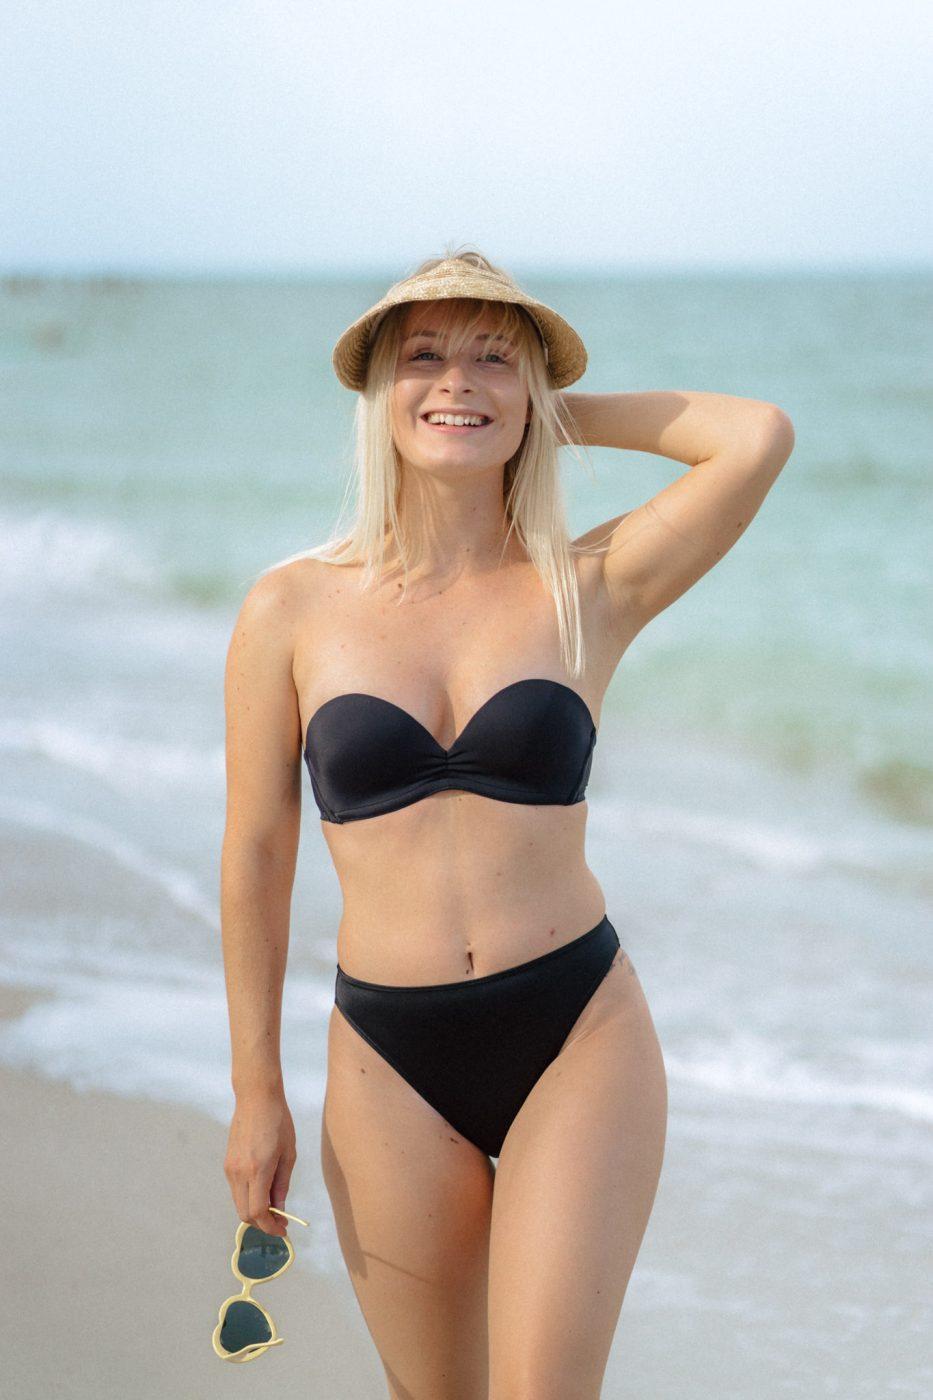 Upbra push up swimsuit in black